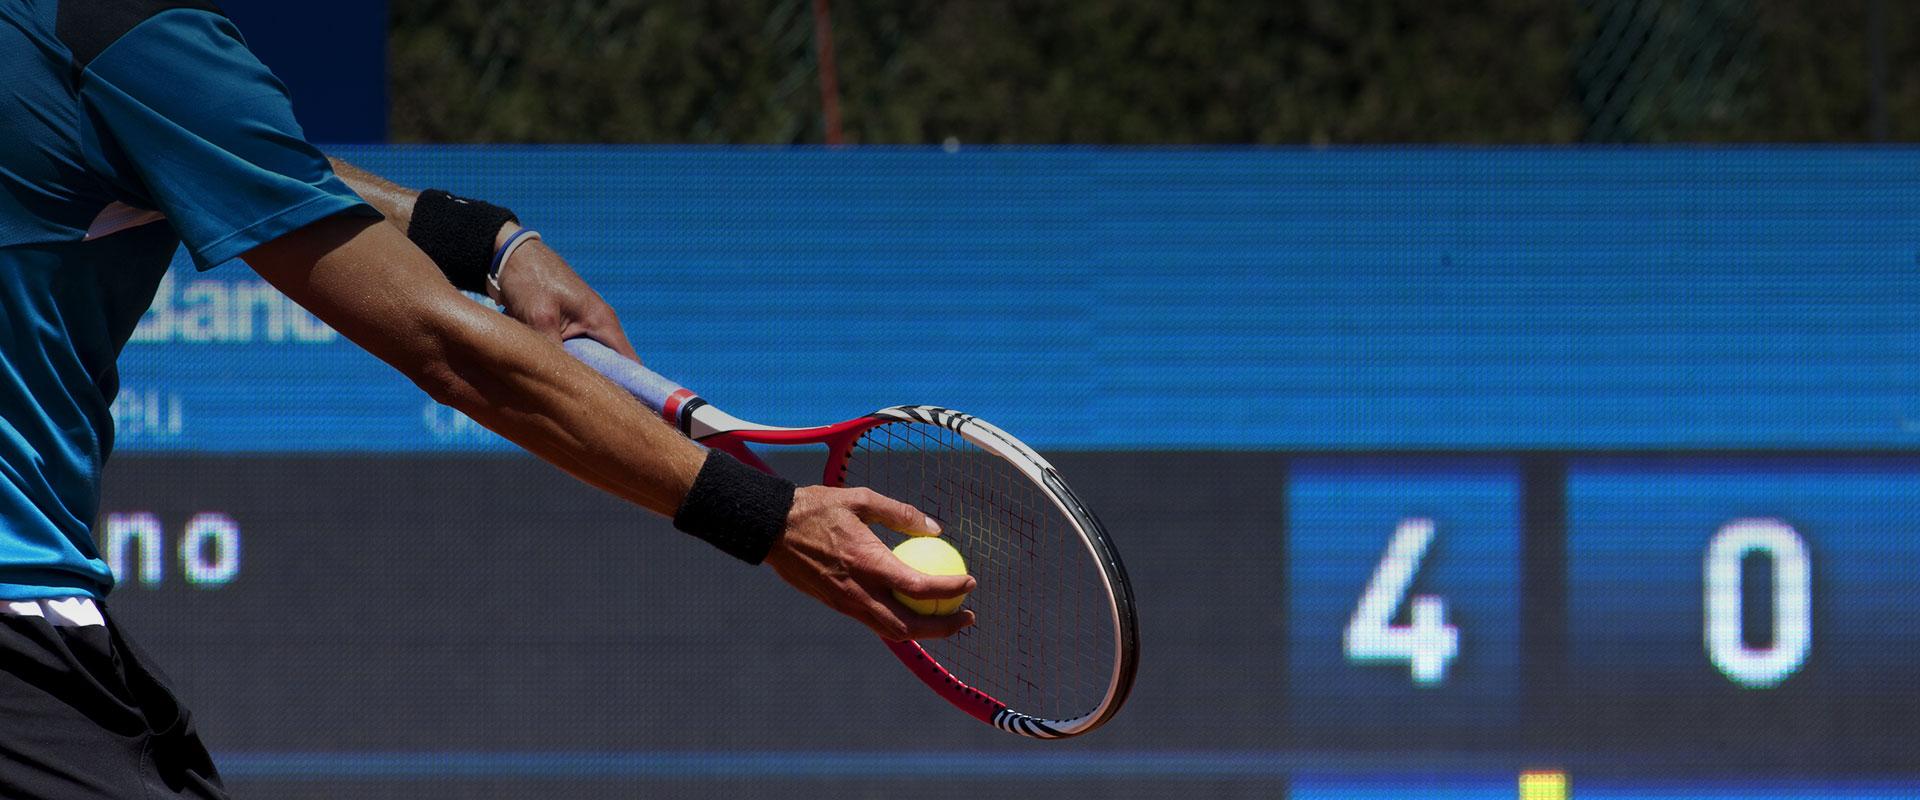 nice-tennis-academy-26